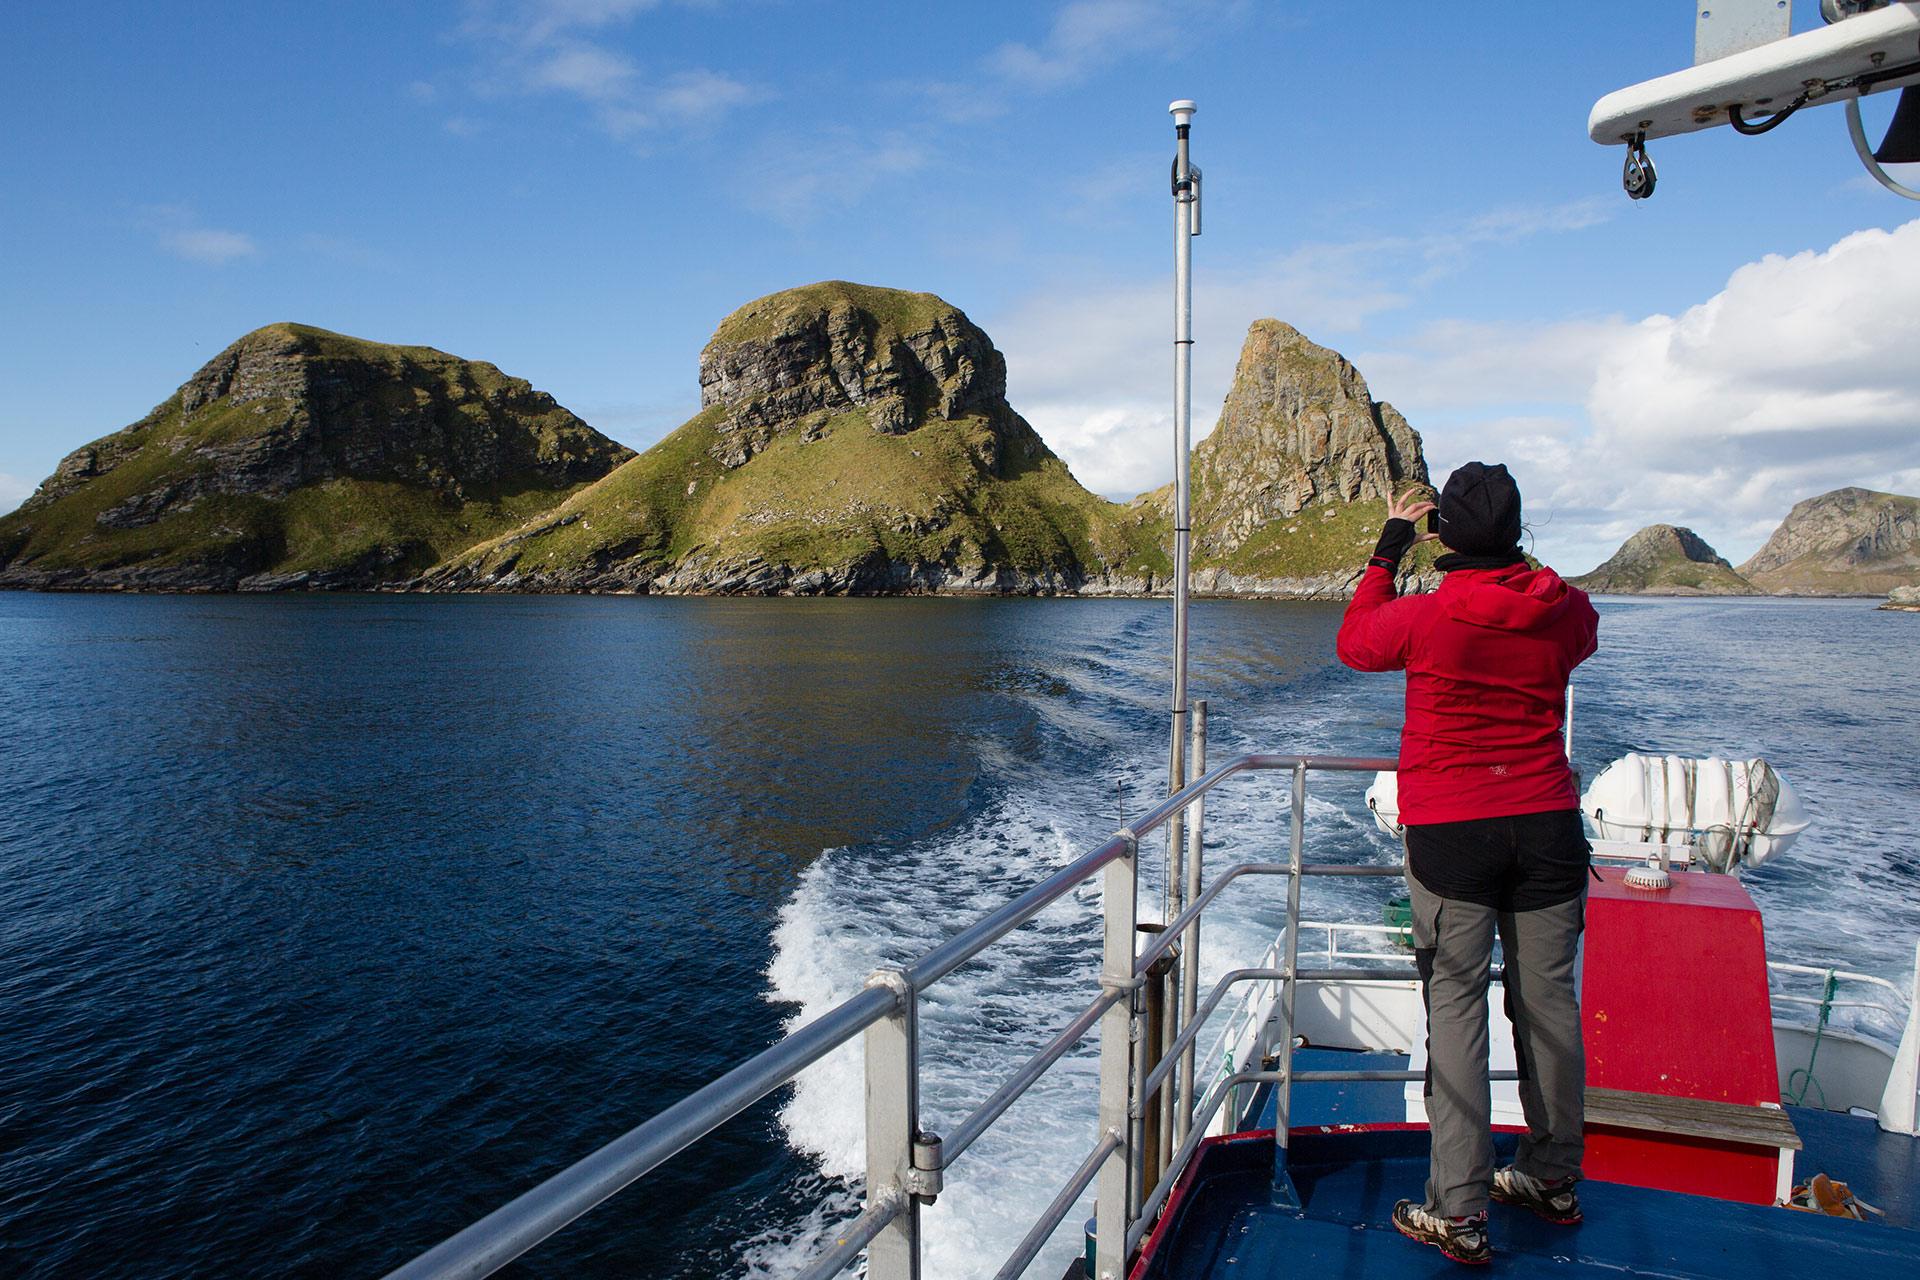 Ferga til Røst går over åpent hav i fire timer © Kristin Folsland Olsen